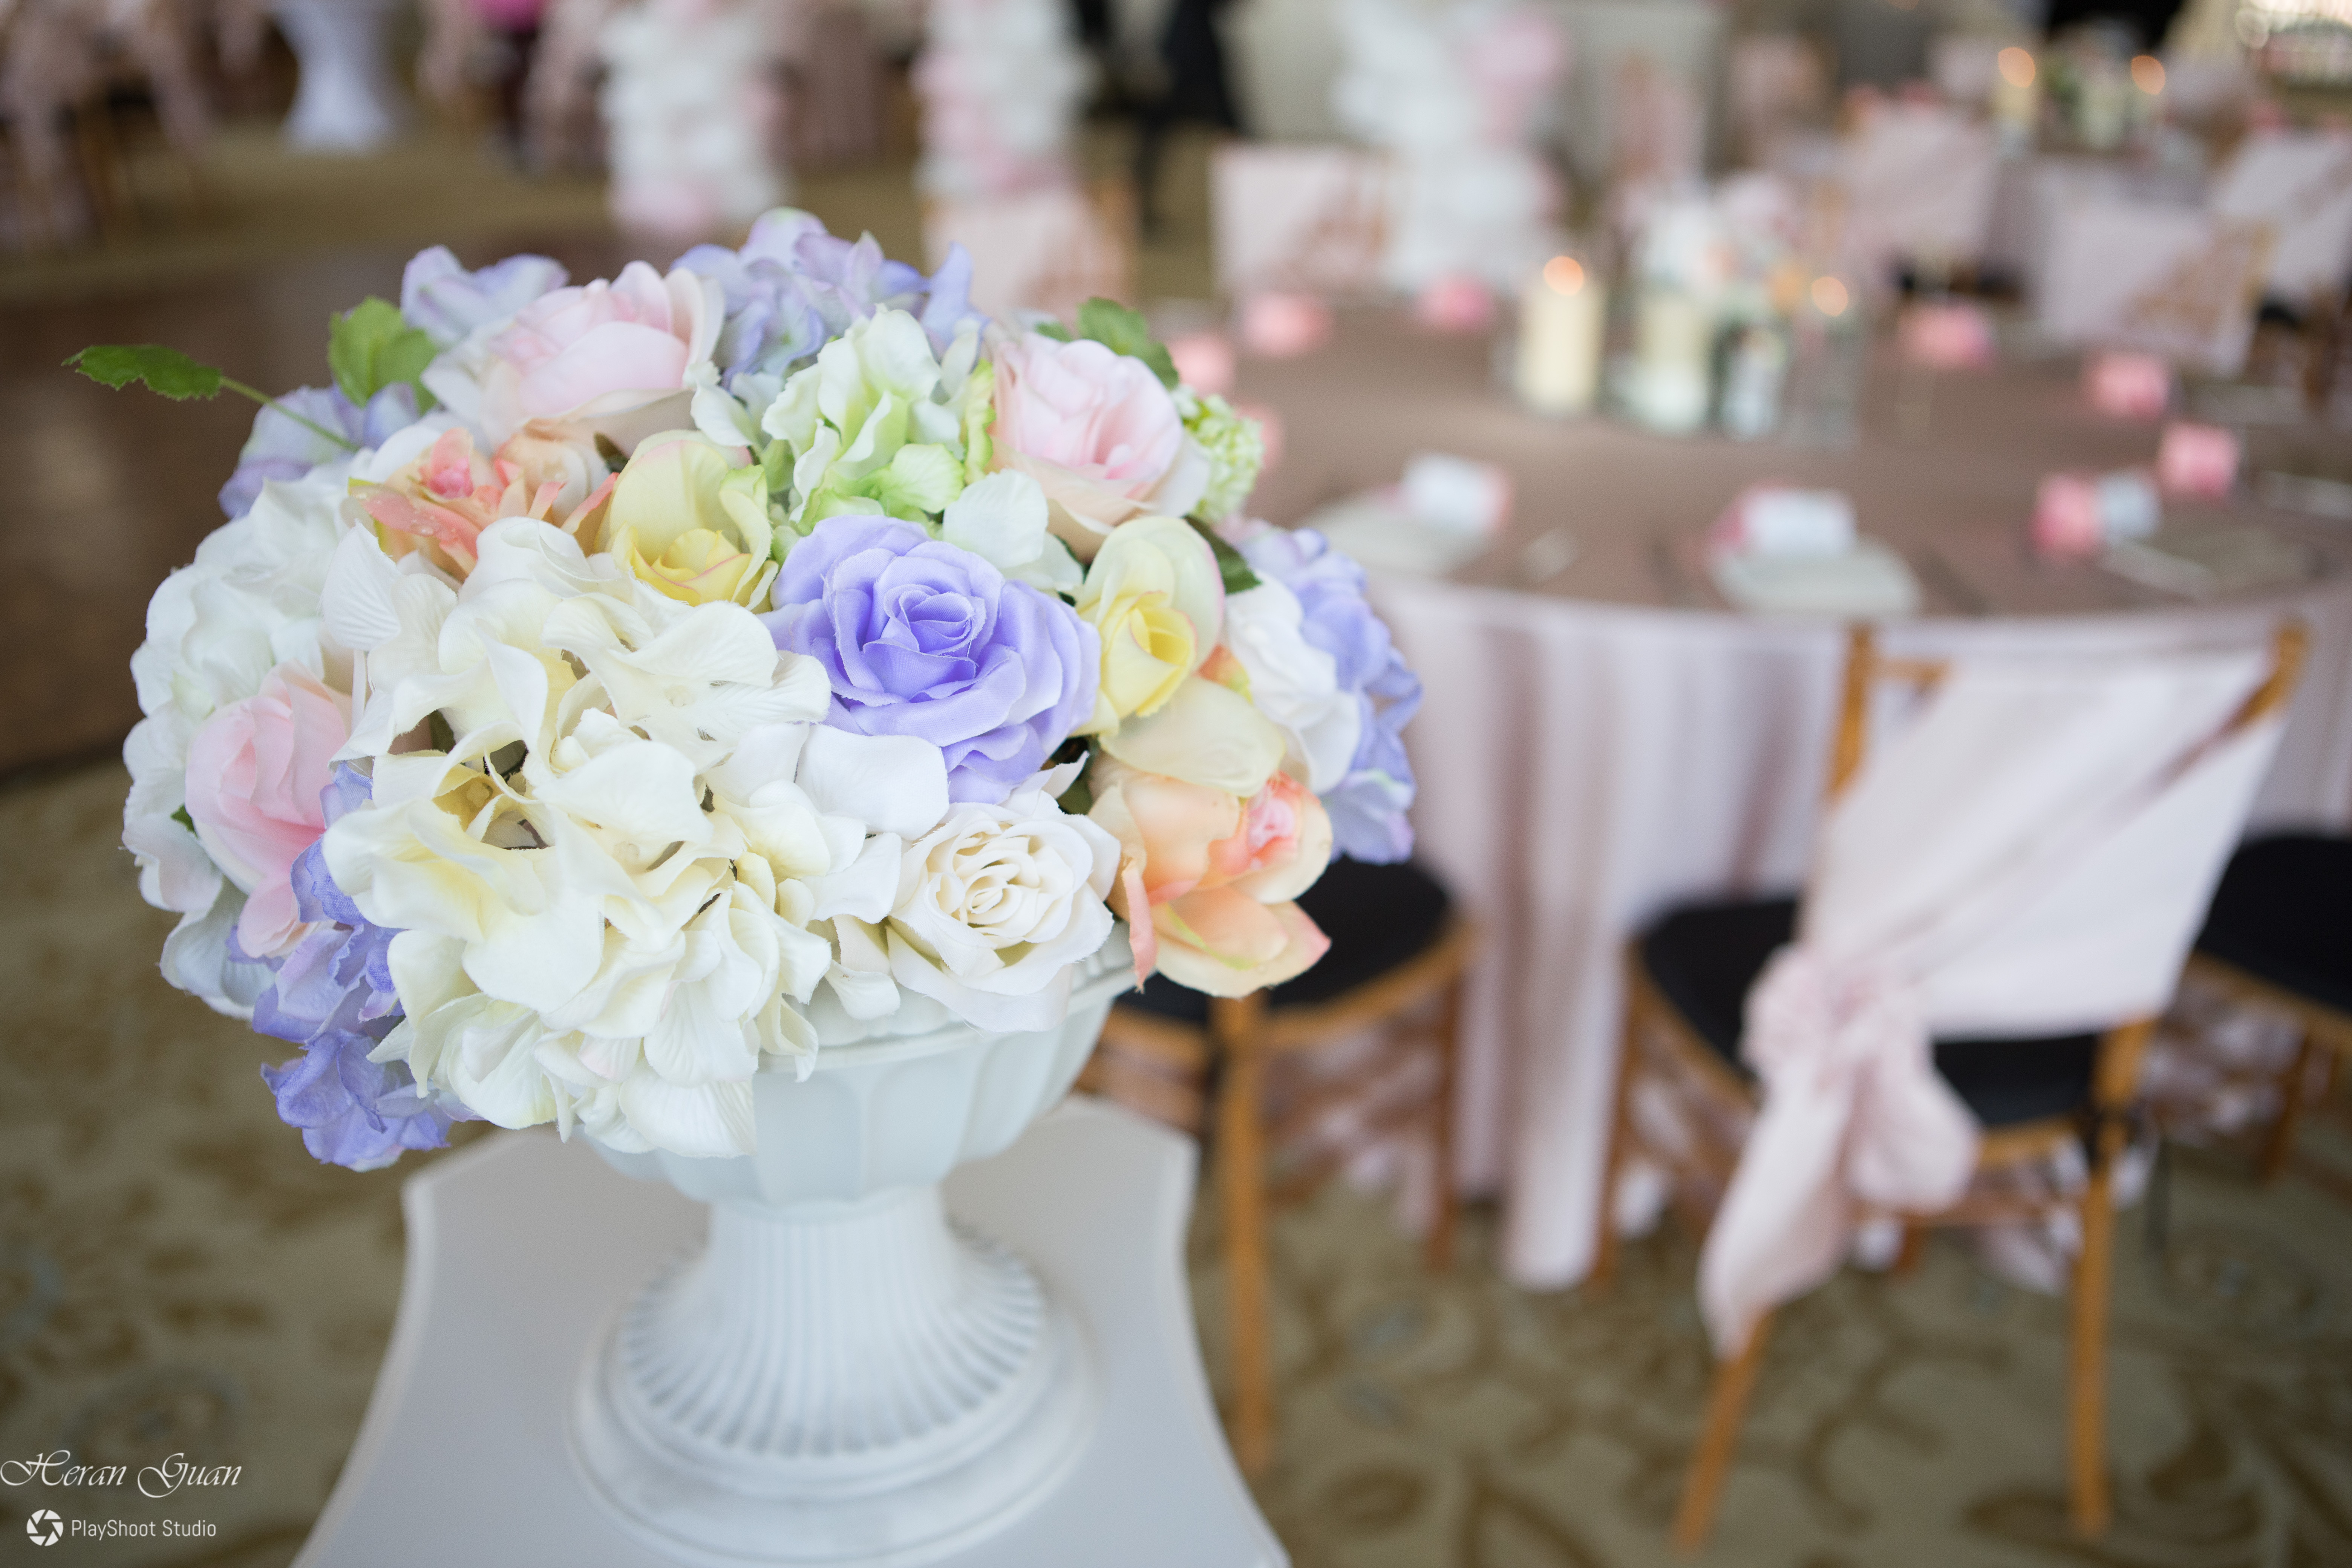 wedding decoration rentals houston texas|wedding decoration store in houston|wedding decorators hous